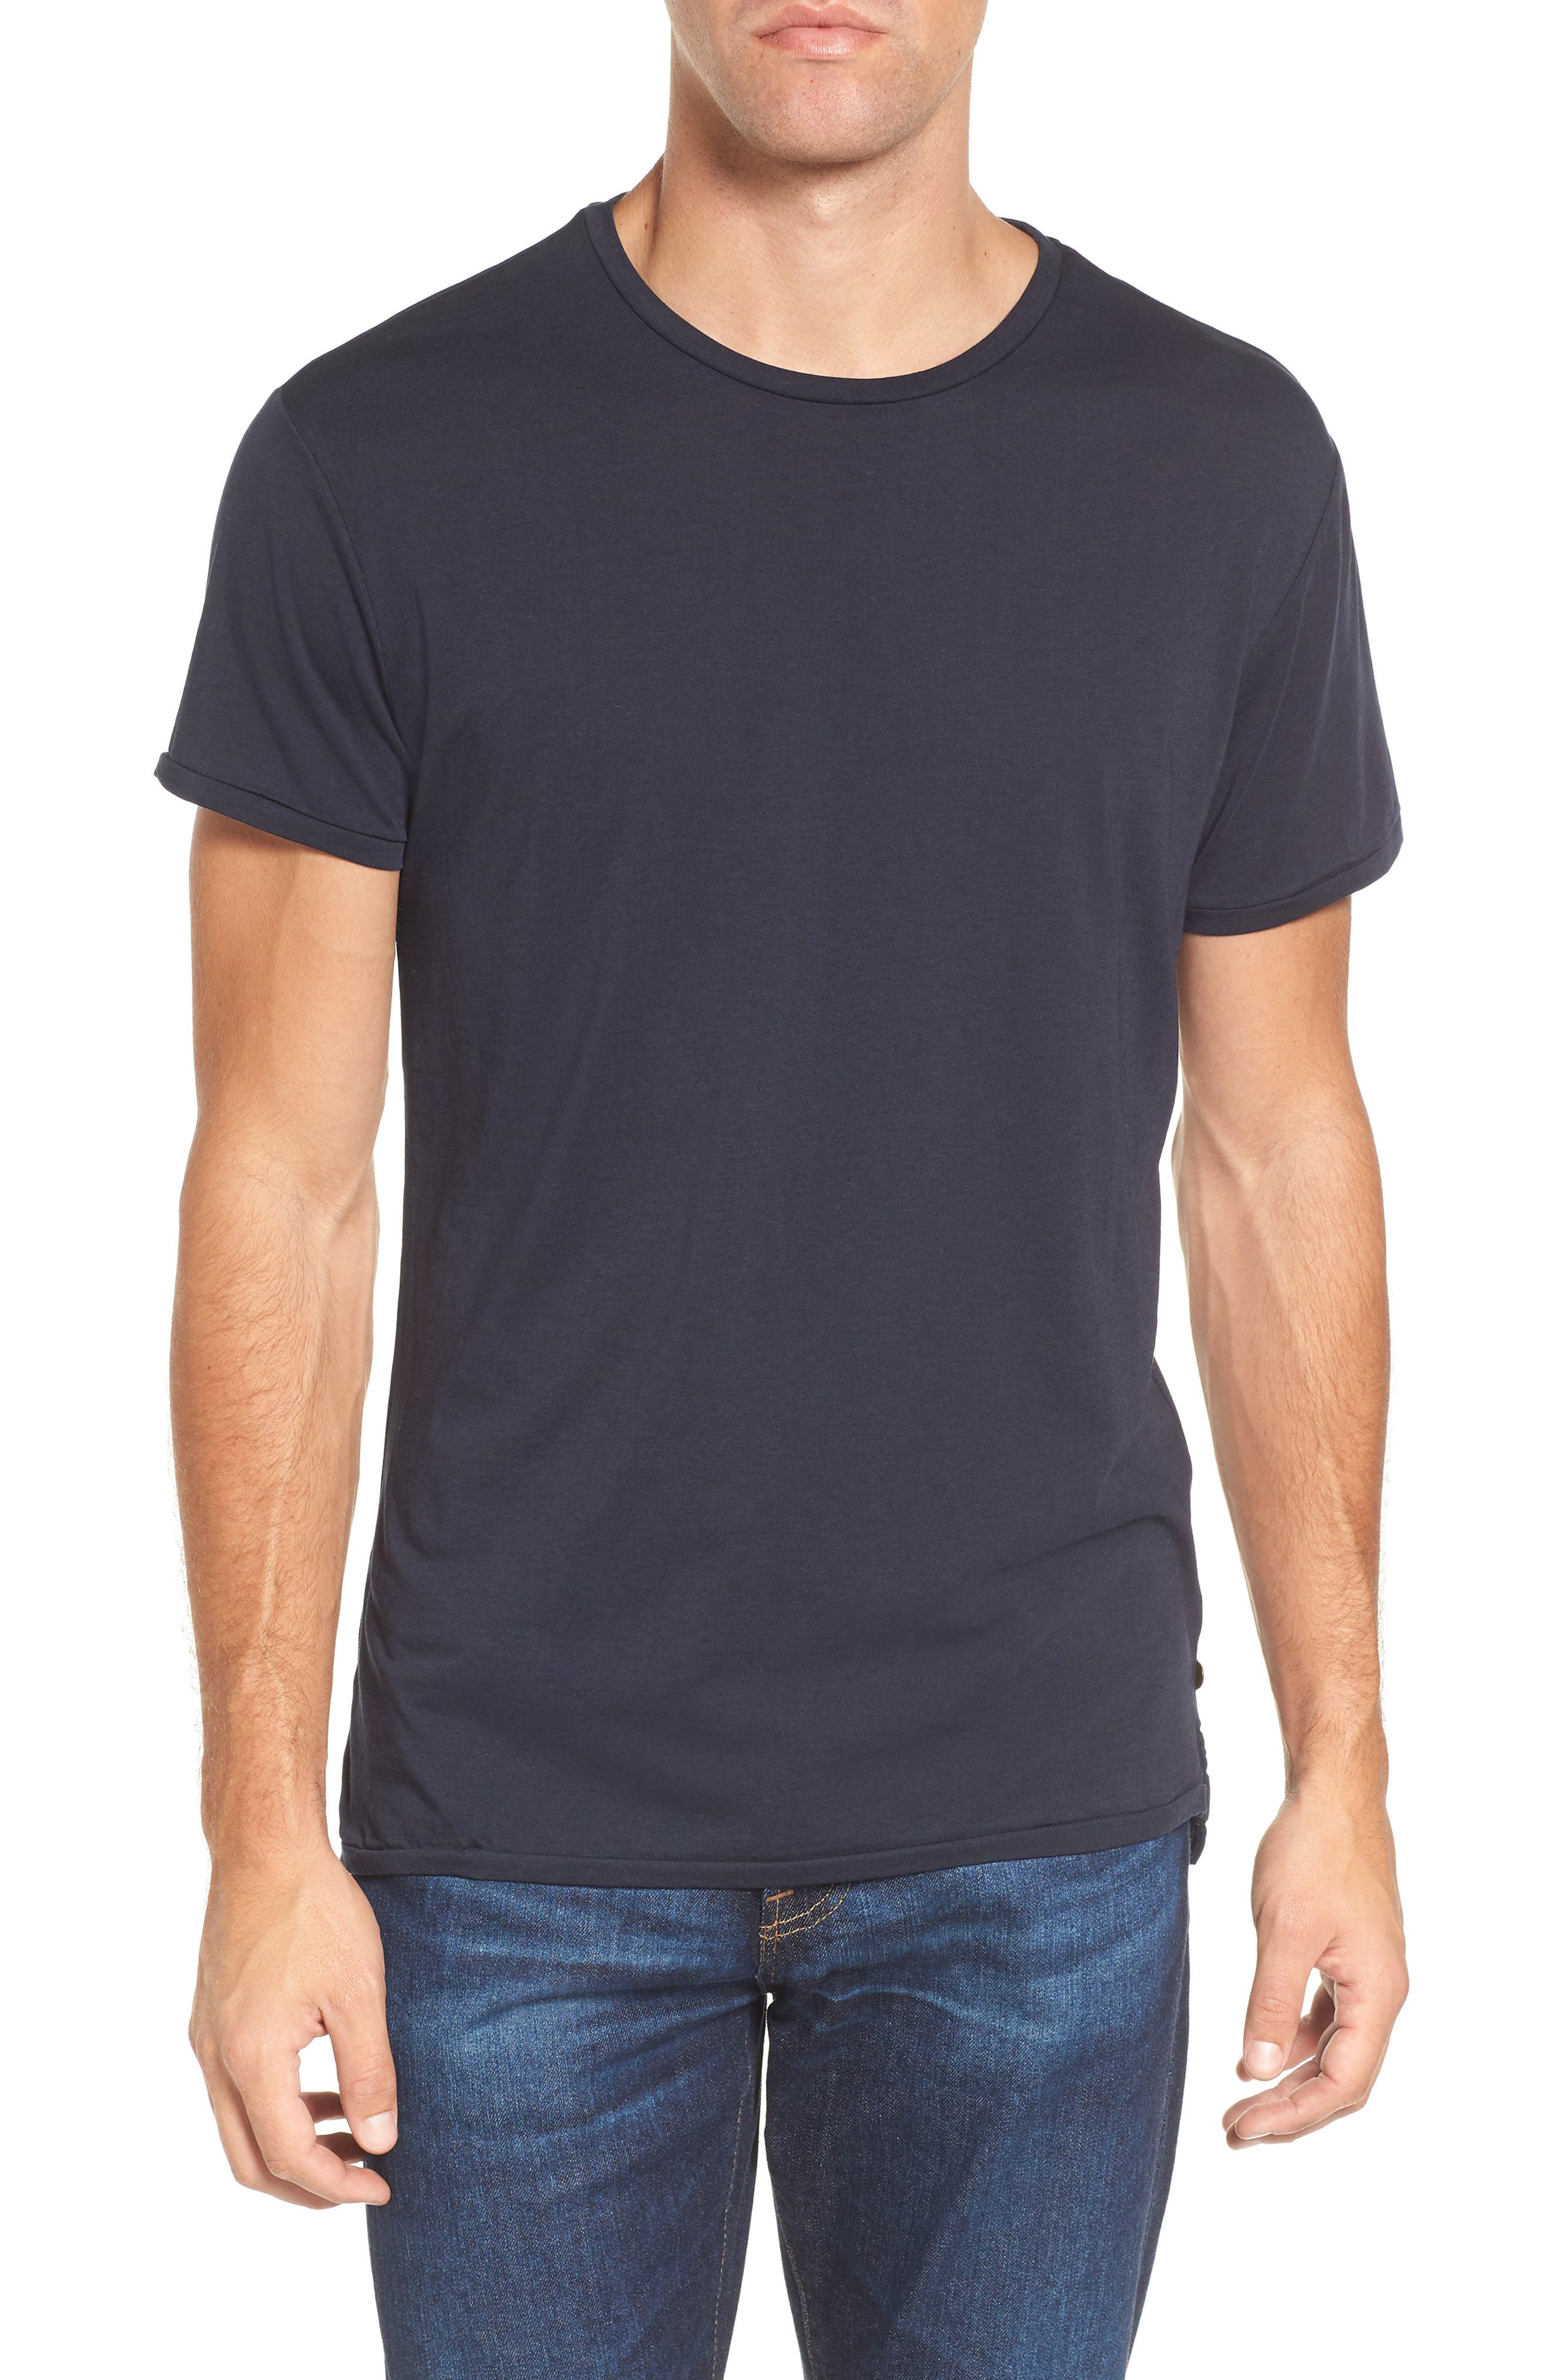 Main Image - Scotch & Soda Chic Crewneck T-Shirt